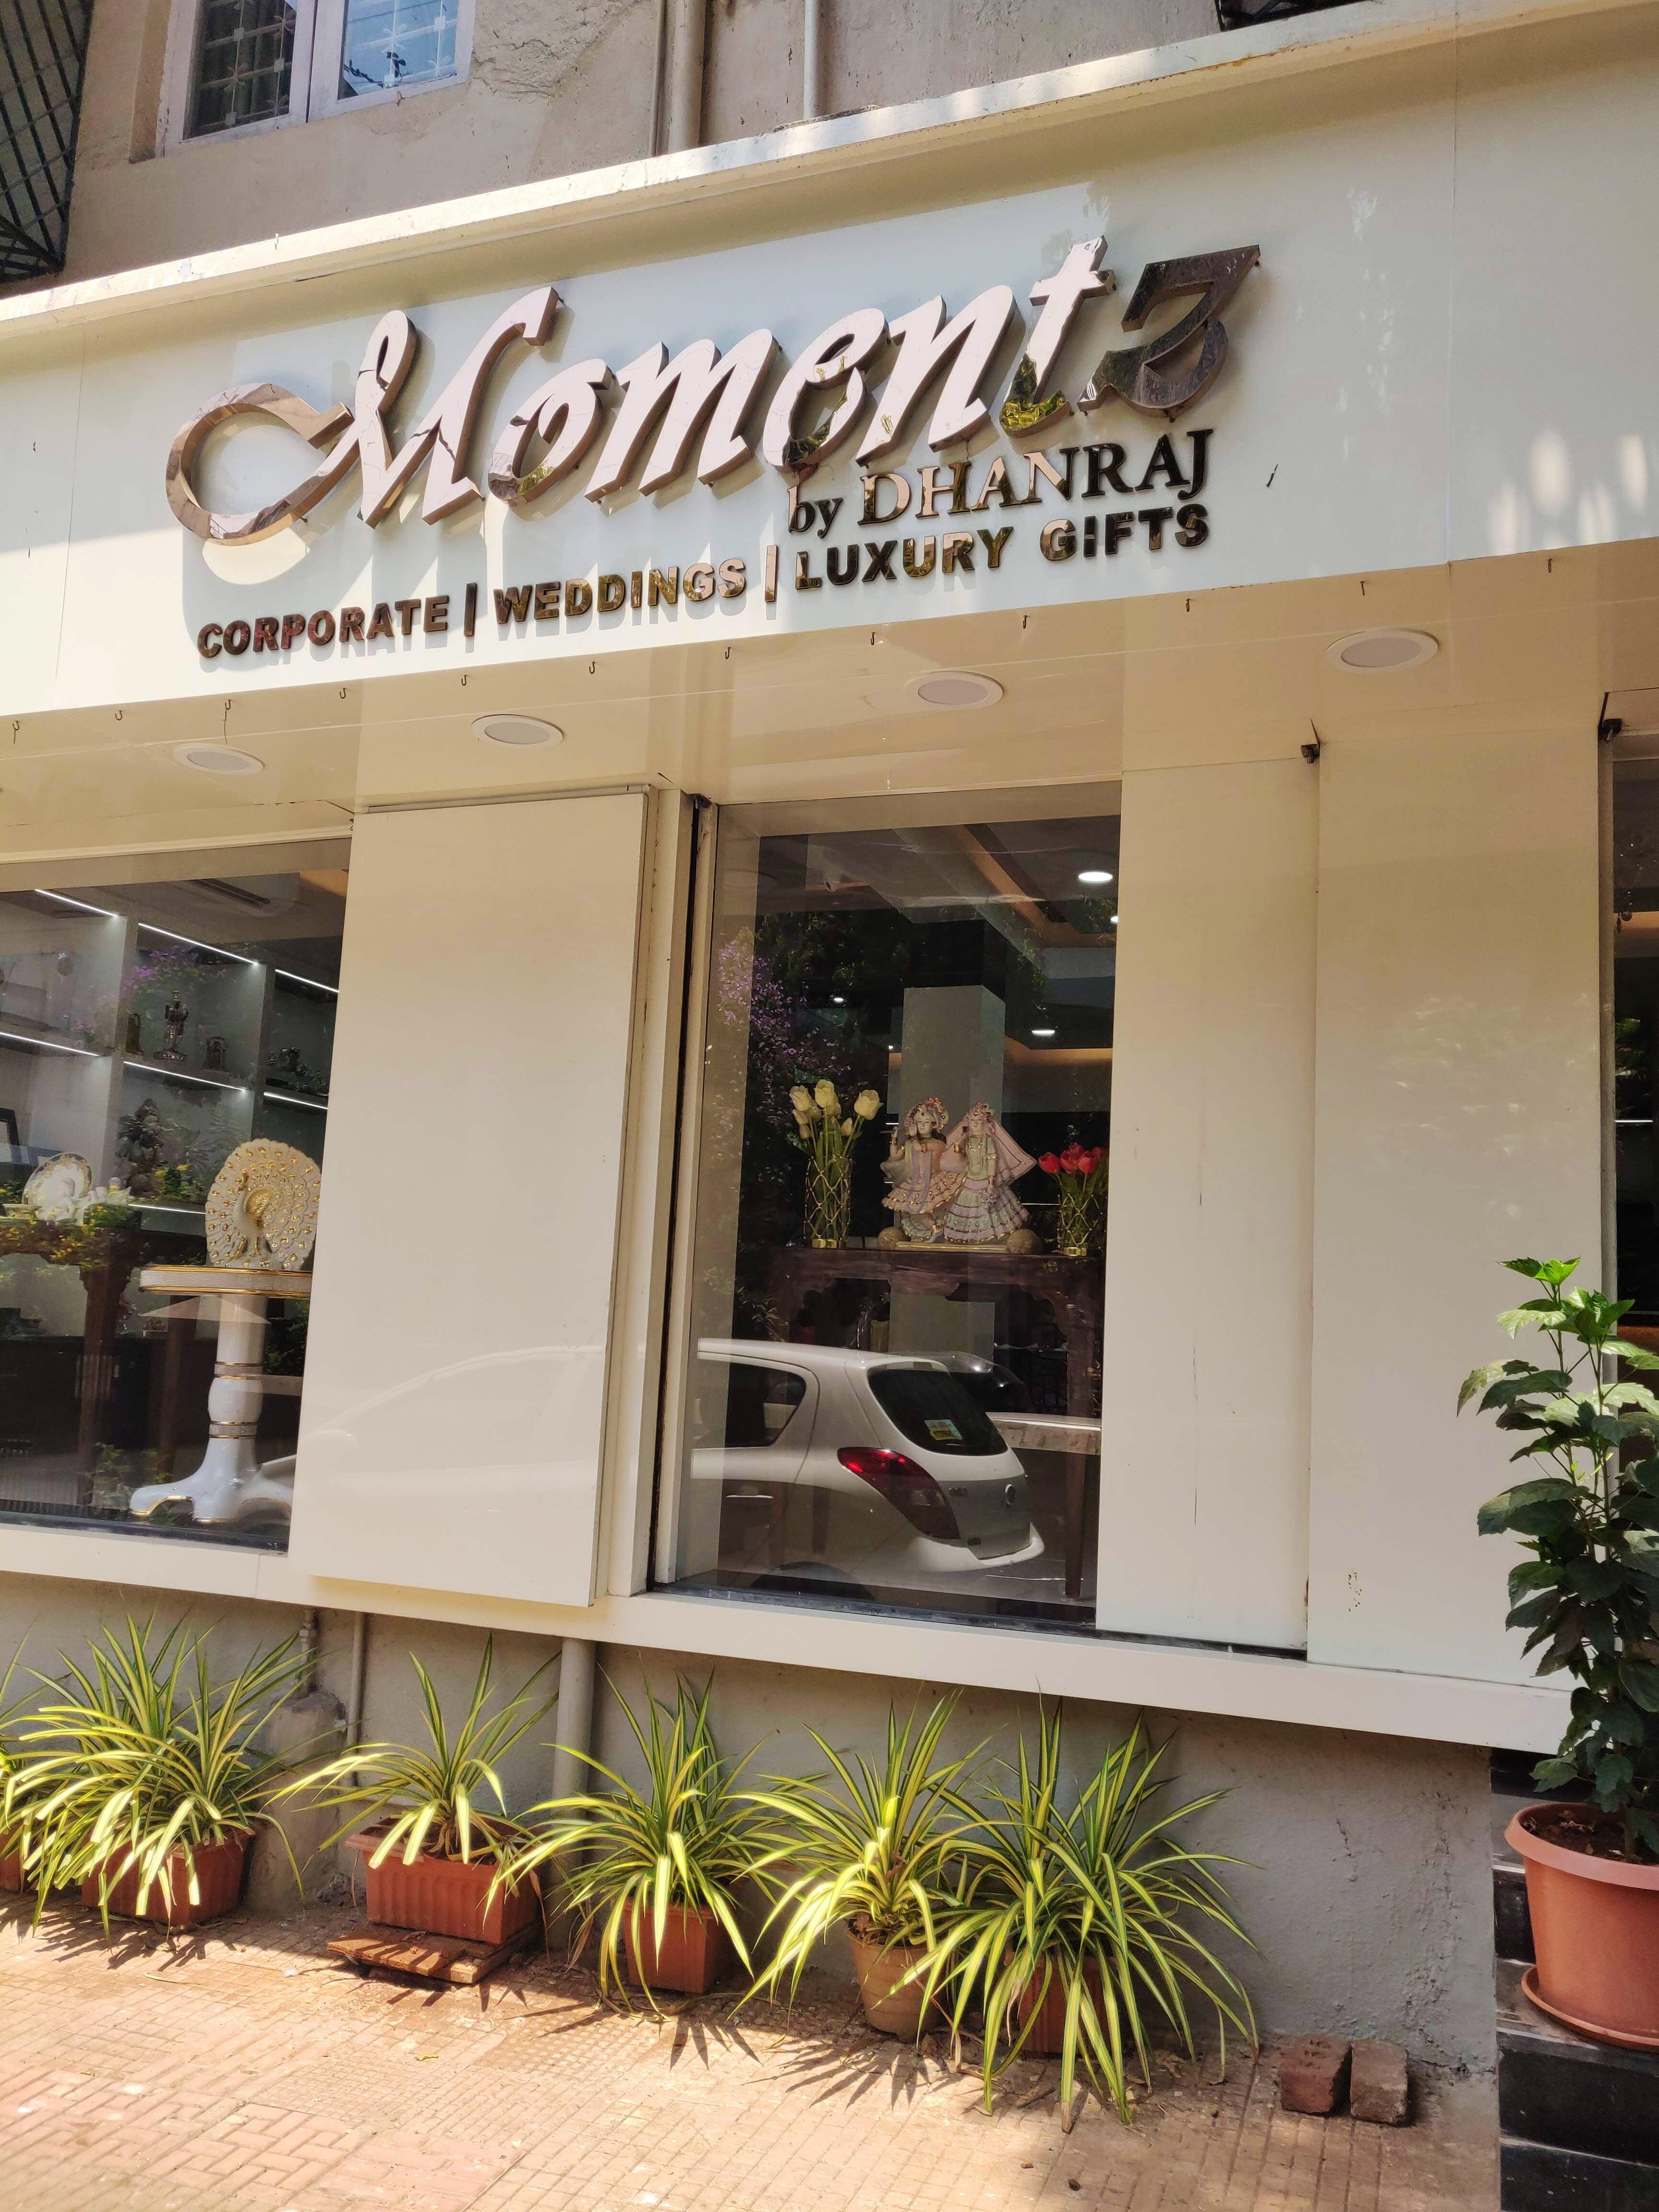 Building,Restaurant,Real estate,Outlet store,Facade,Signage,Cuisine